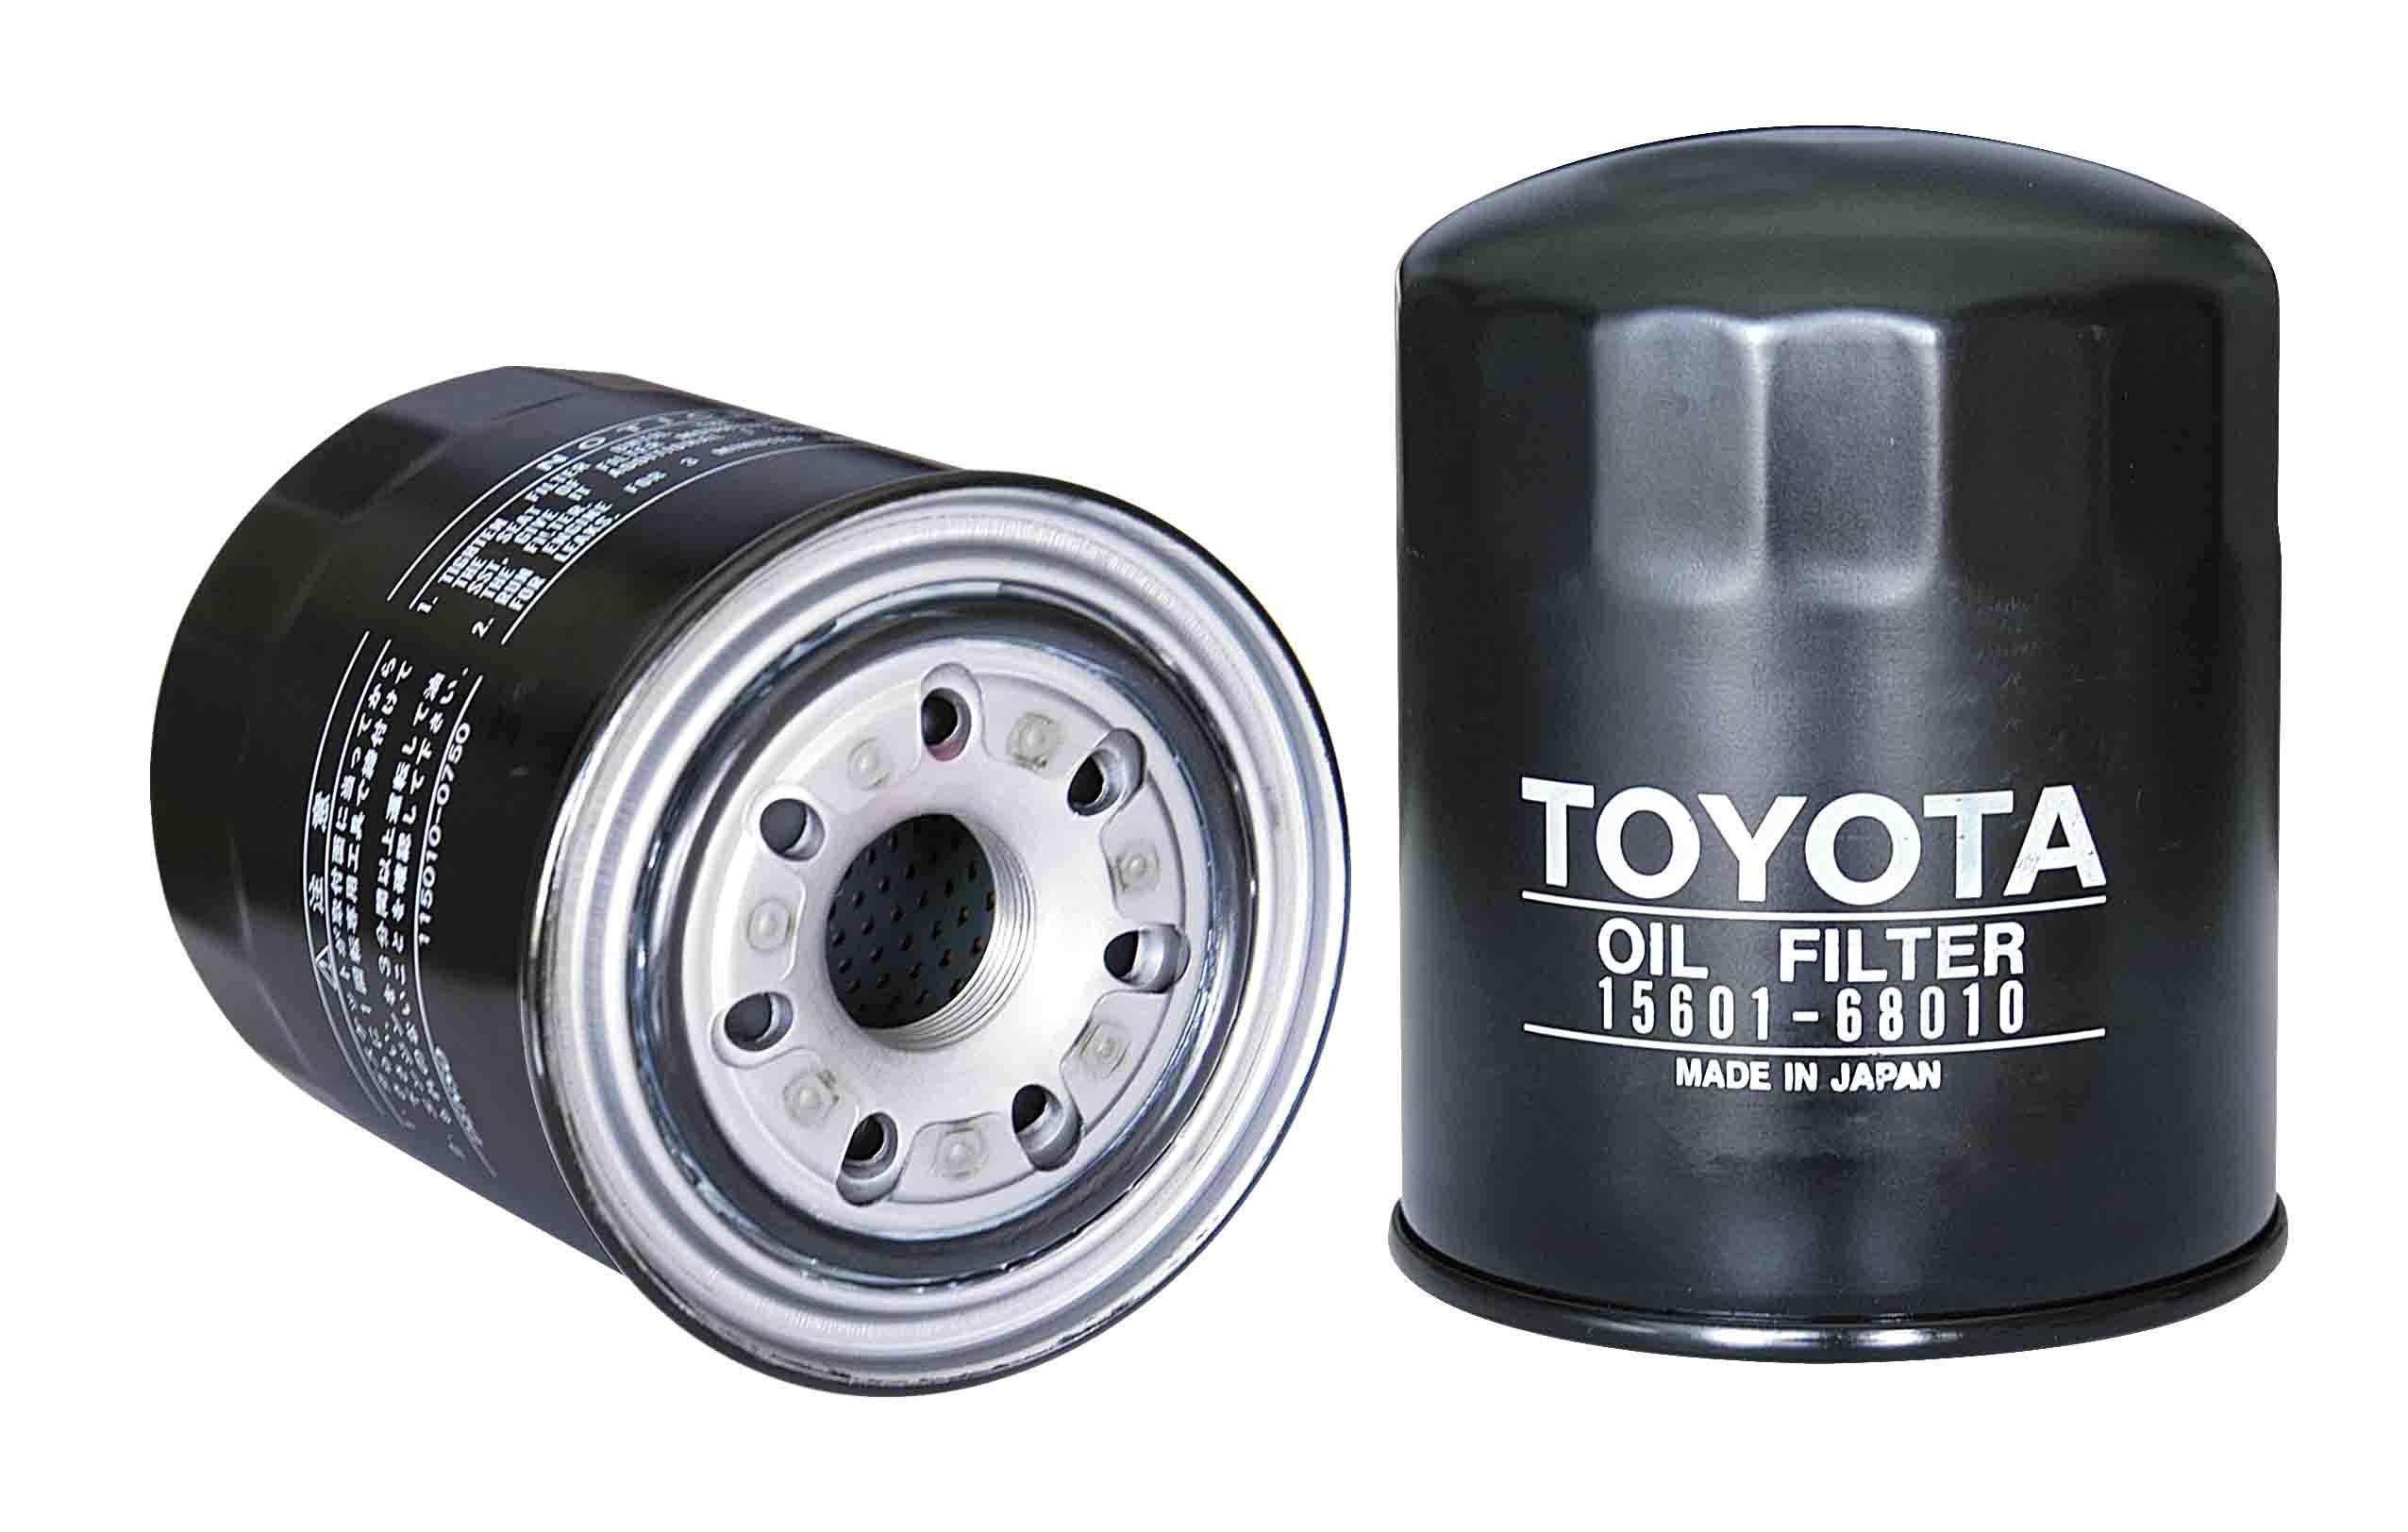 Oil Filters September 2015 Duplex Fuel Filter Mann Hummel Toyota Images